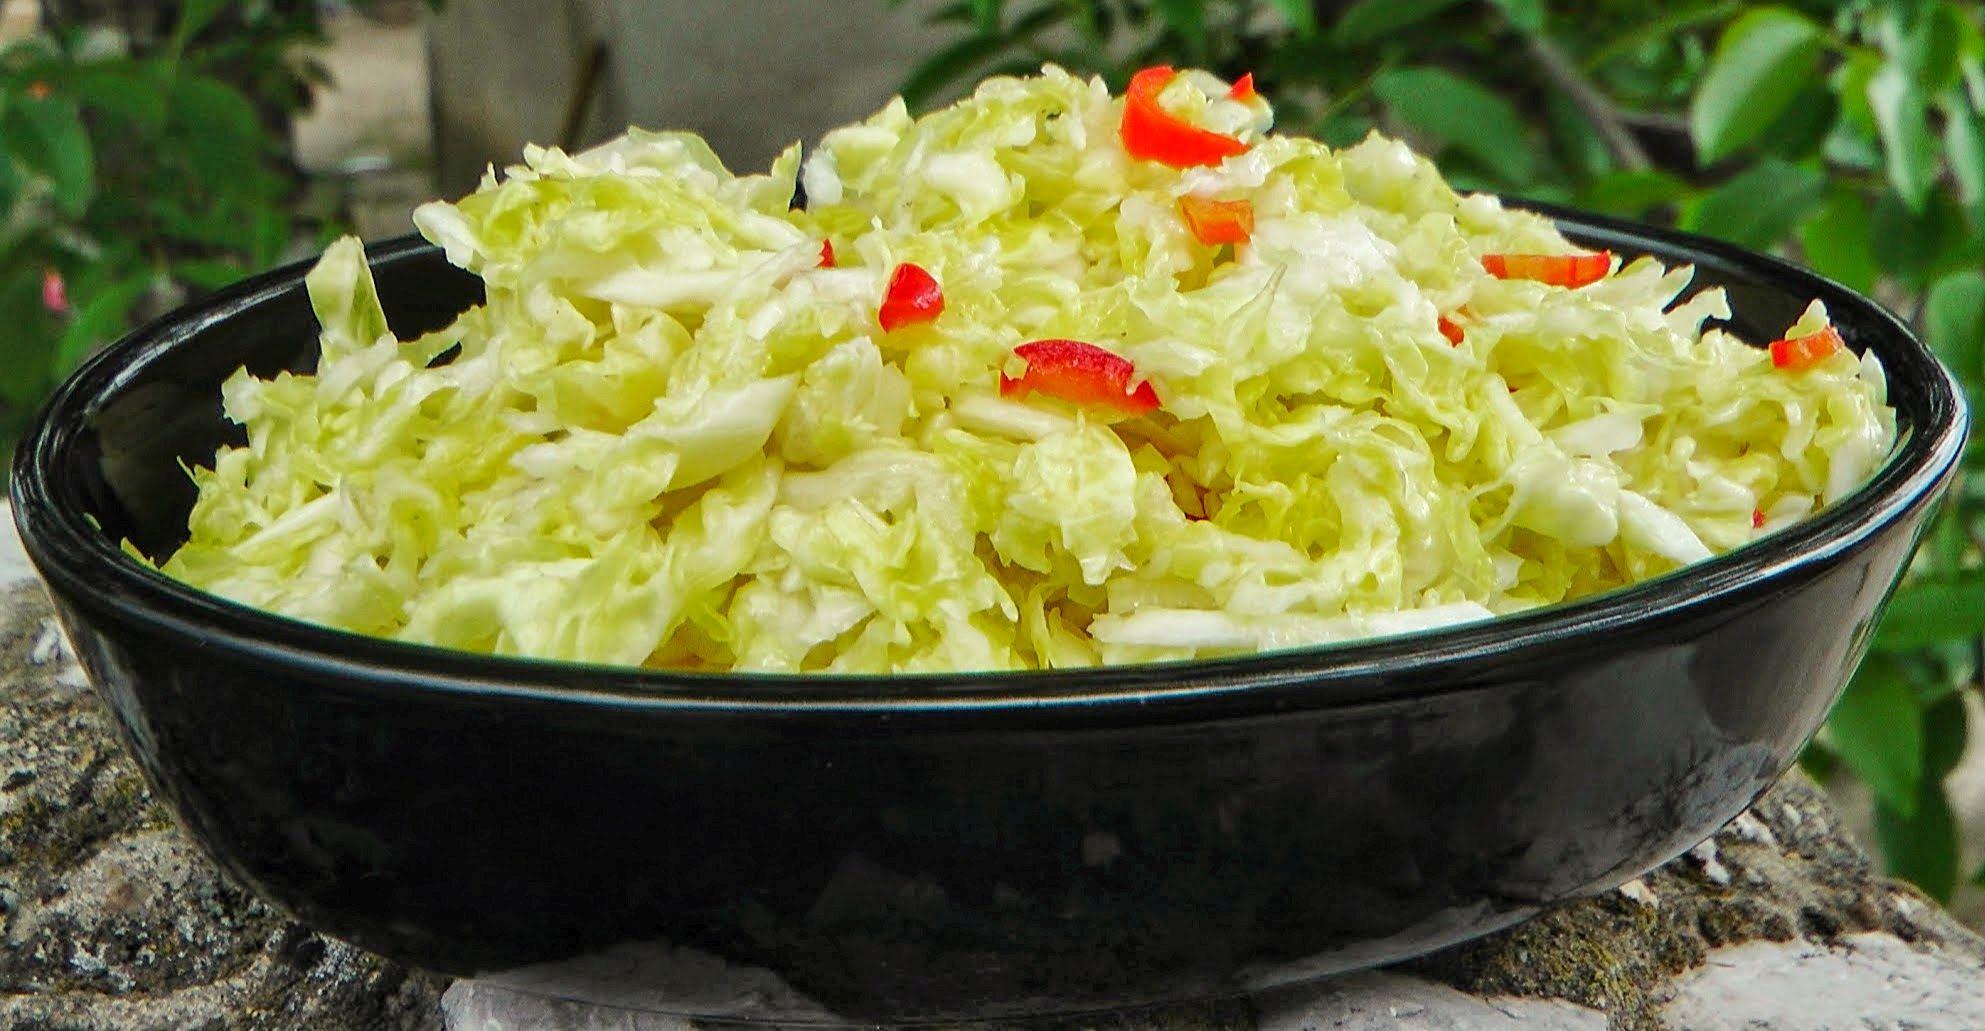 kelkaposzta-salata-chilivel.jpg